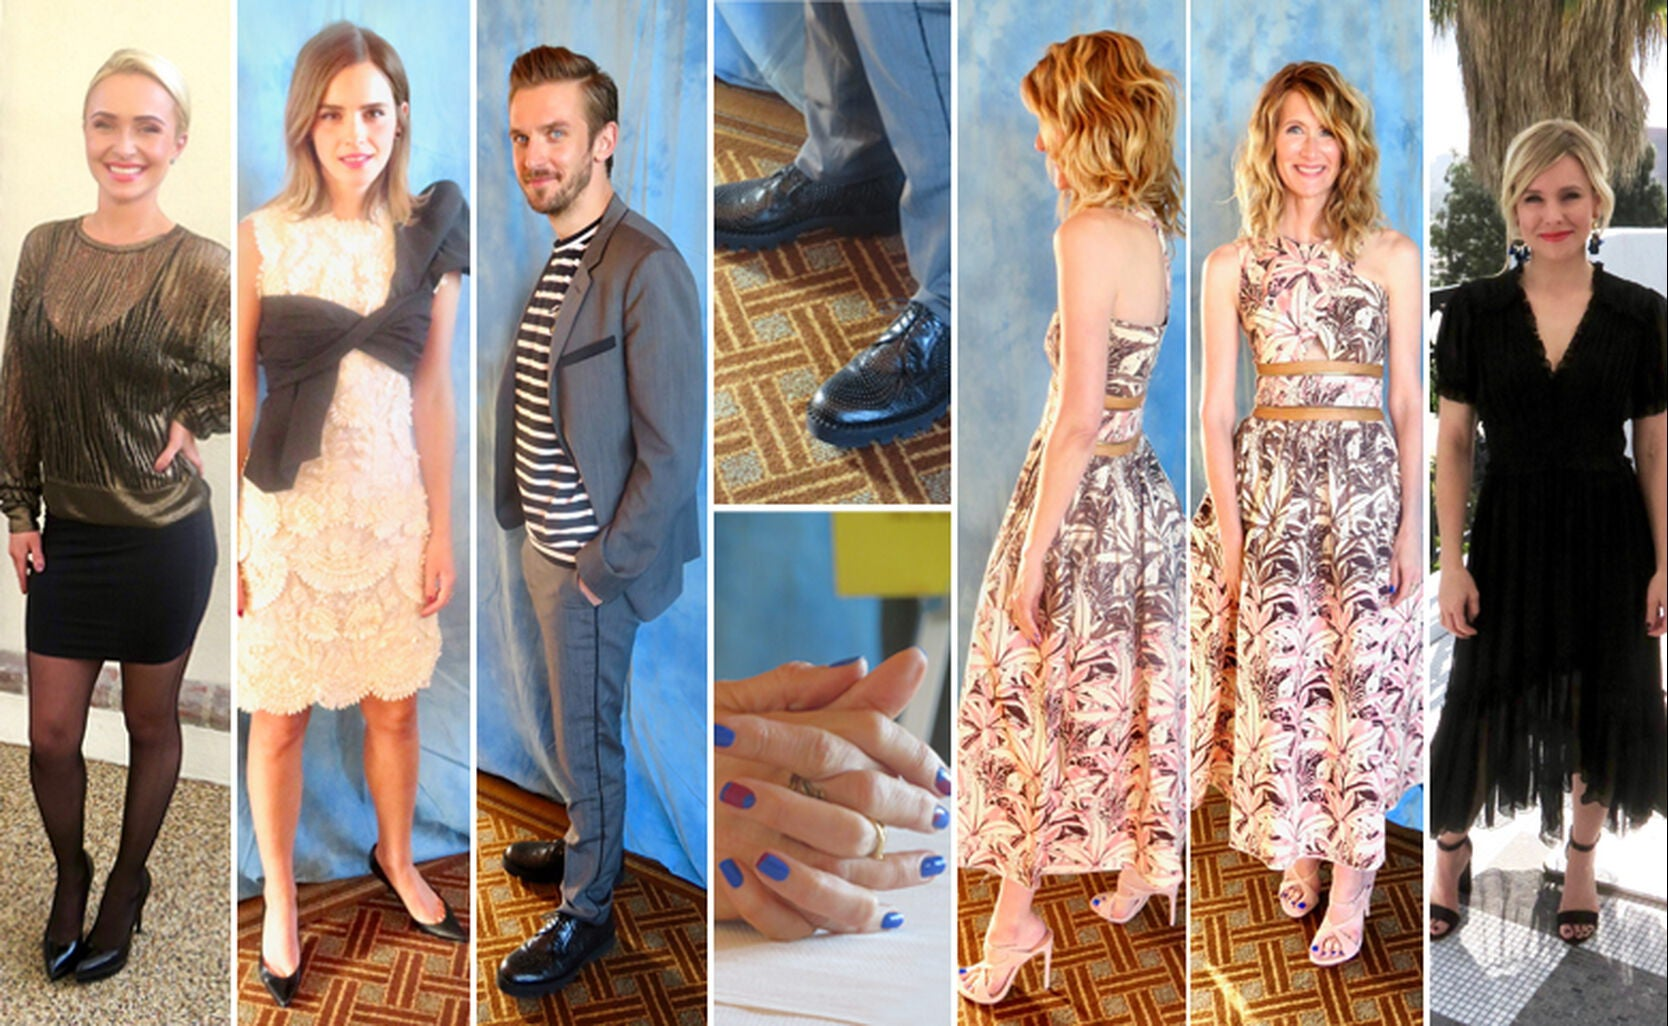 Hayden Panettiere, Emma Watson, Dan Stevens, Laura Dern and Kristen Bell